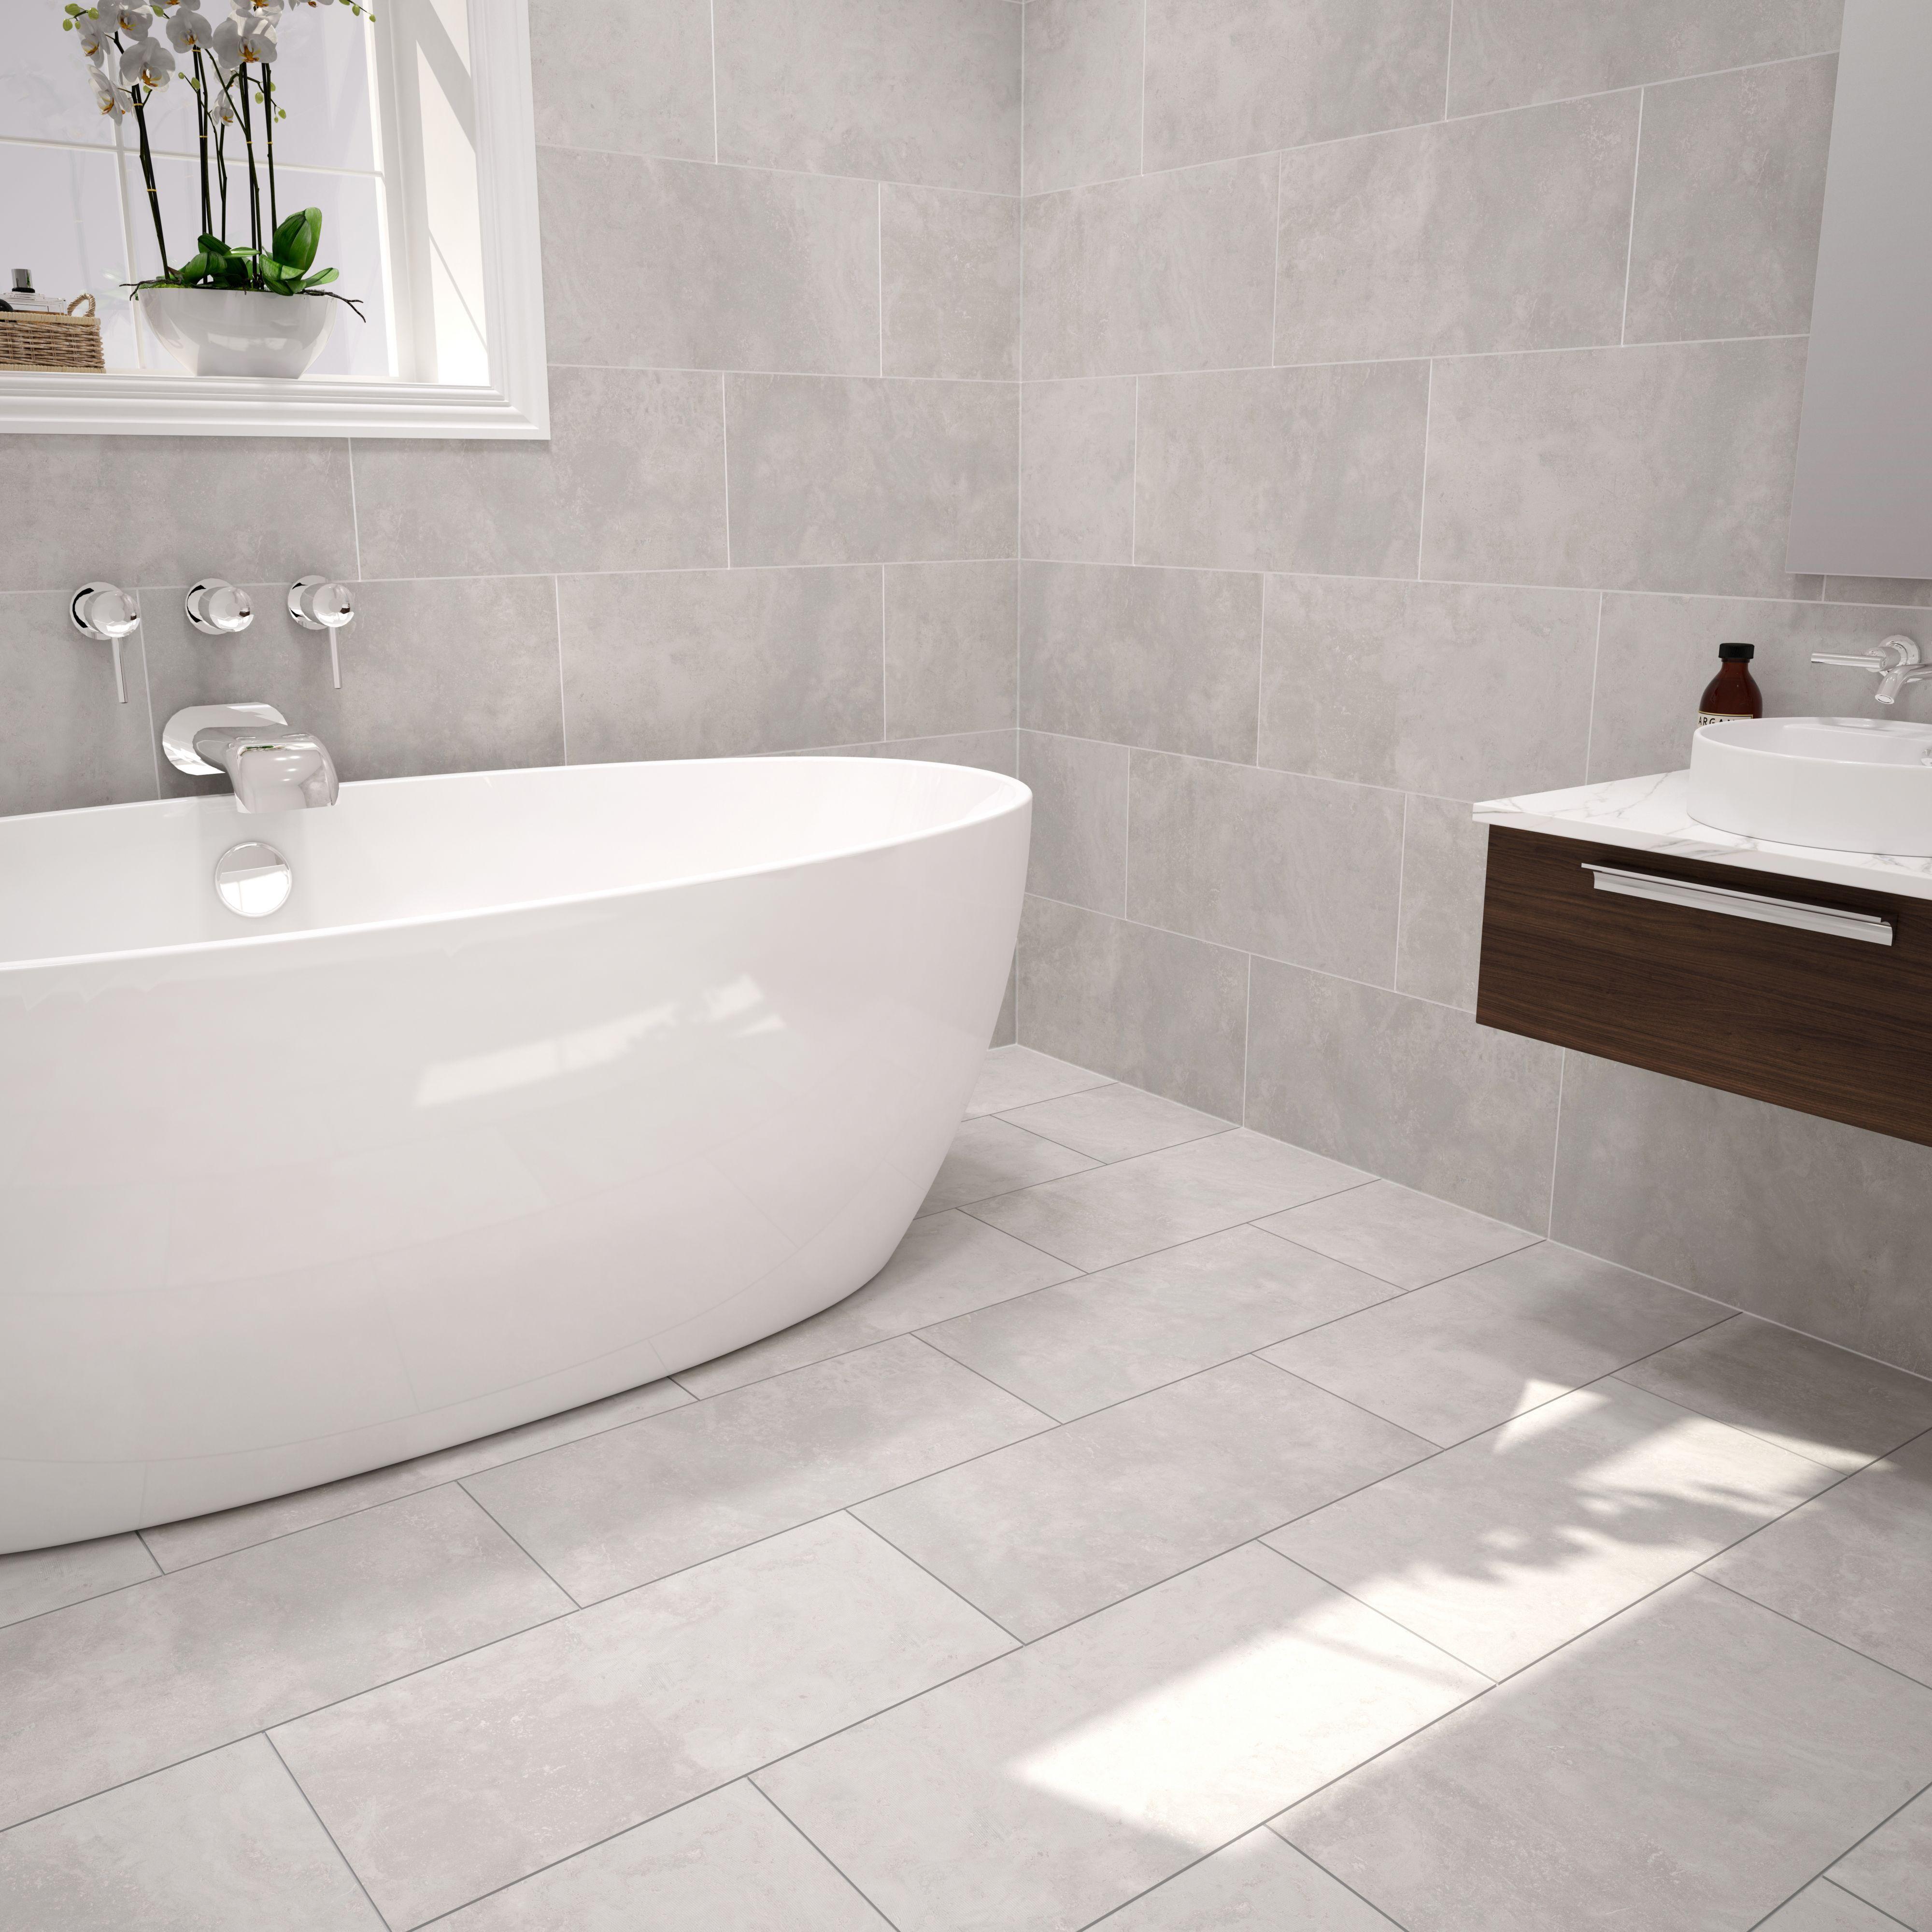 Matt Grey Bathroom Wall Tiles